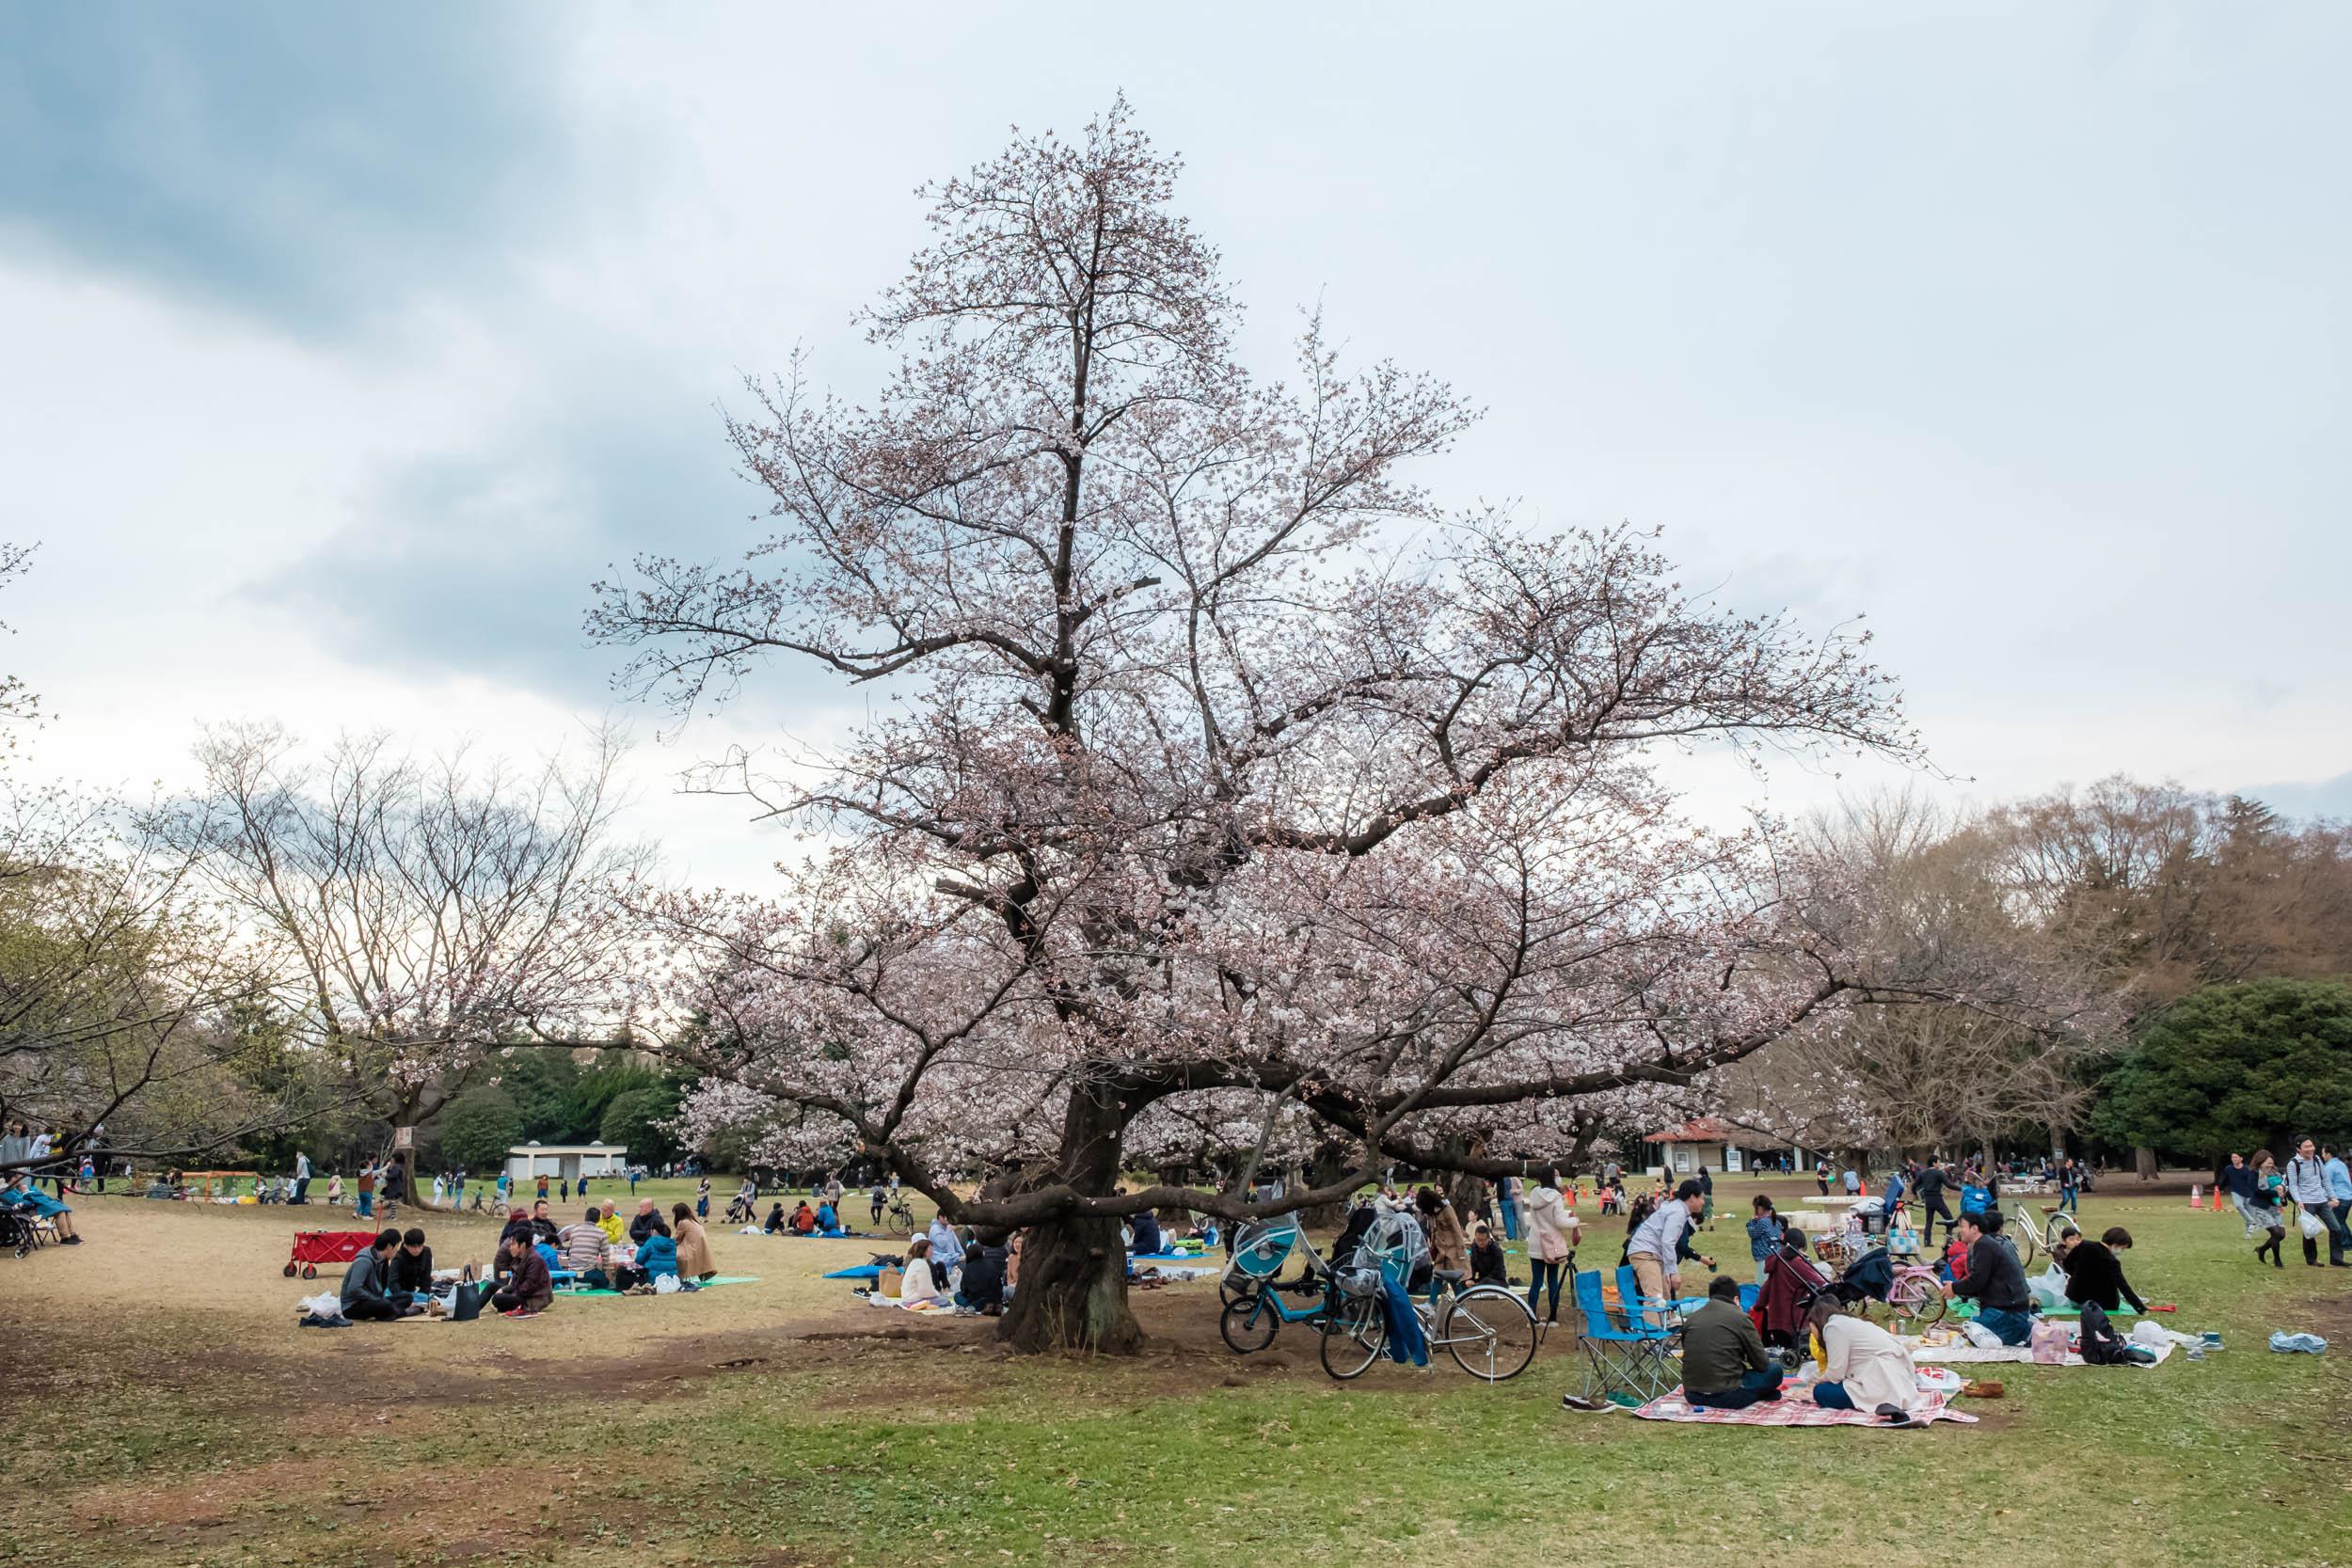 Hikarigaoka Park always has lots of picnics